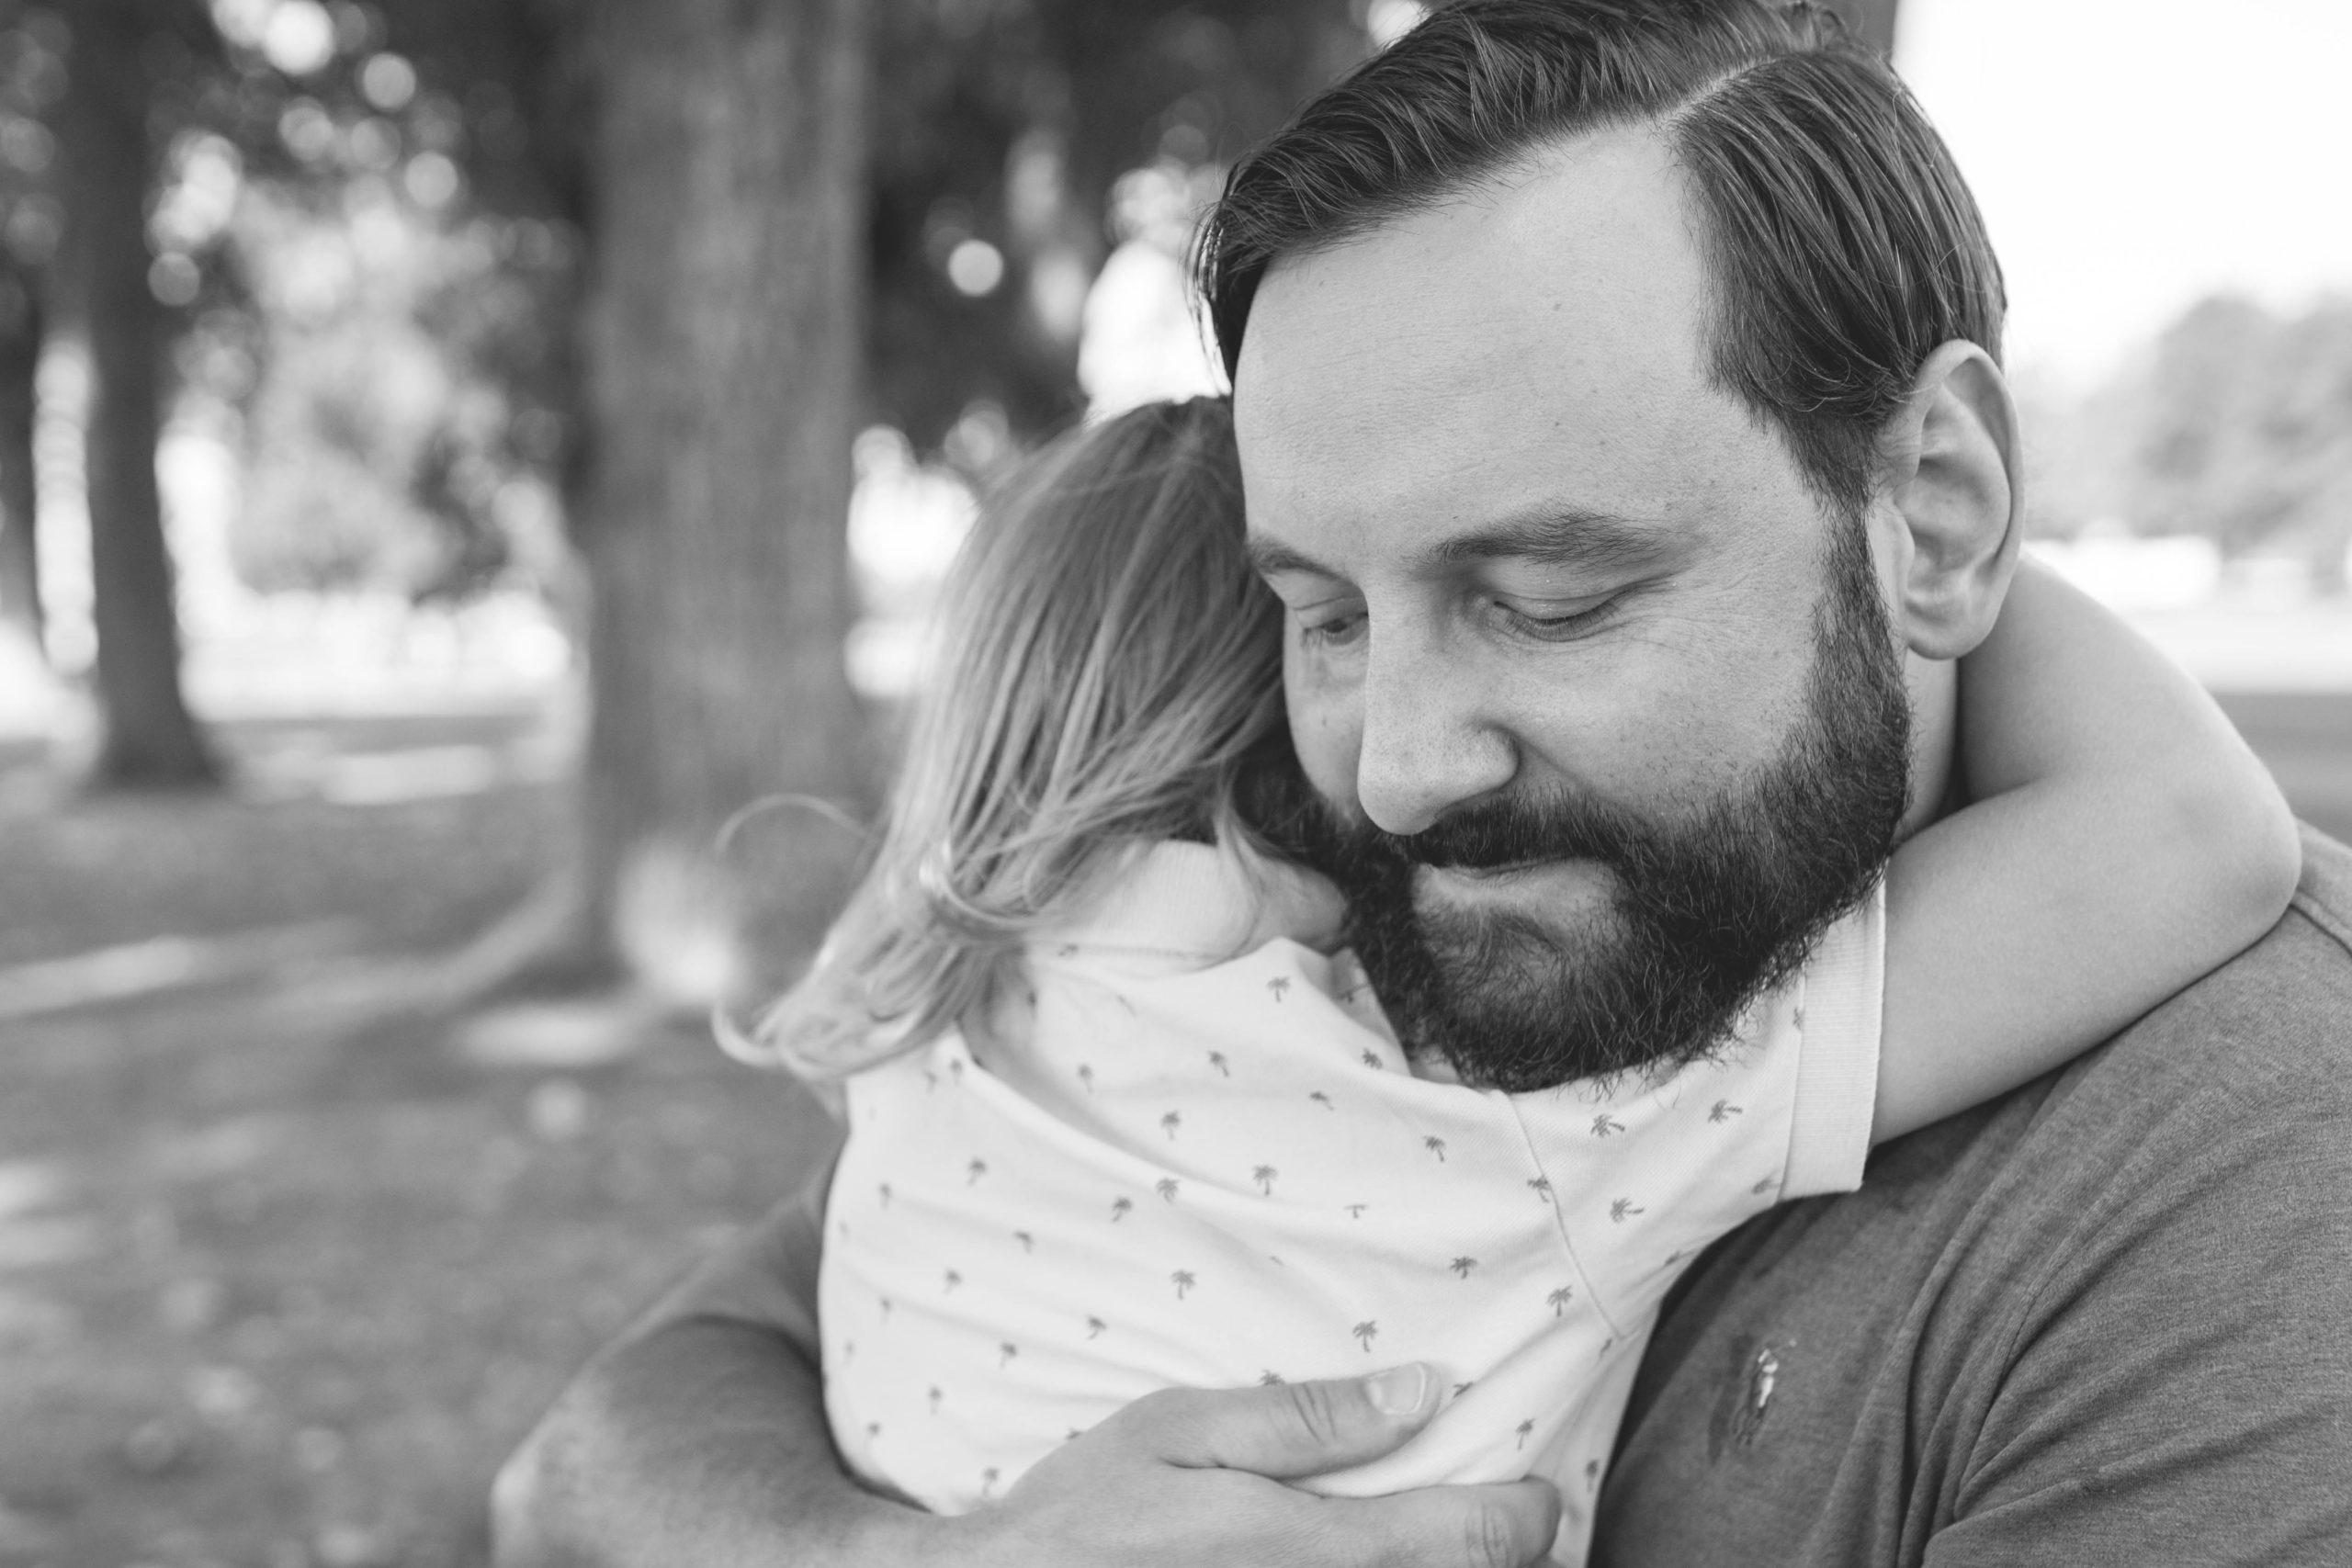 Familienfotos, Fotografkoeln, Familienshooting, Outdoorfamilienshooting